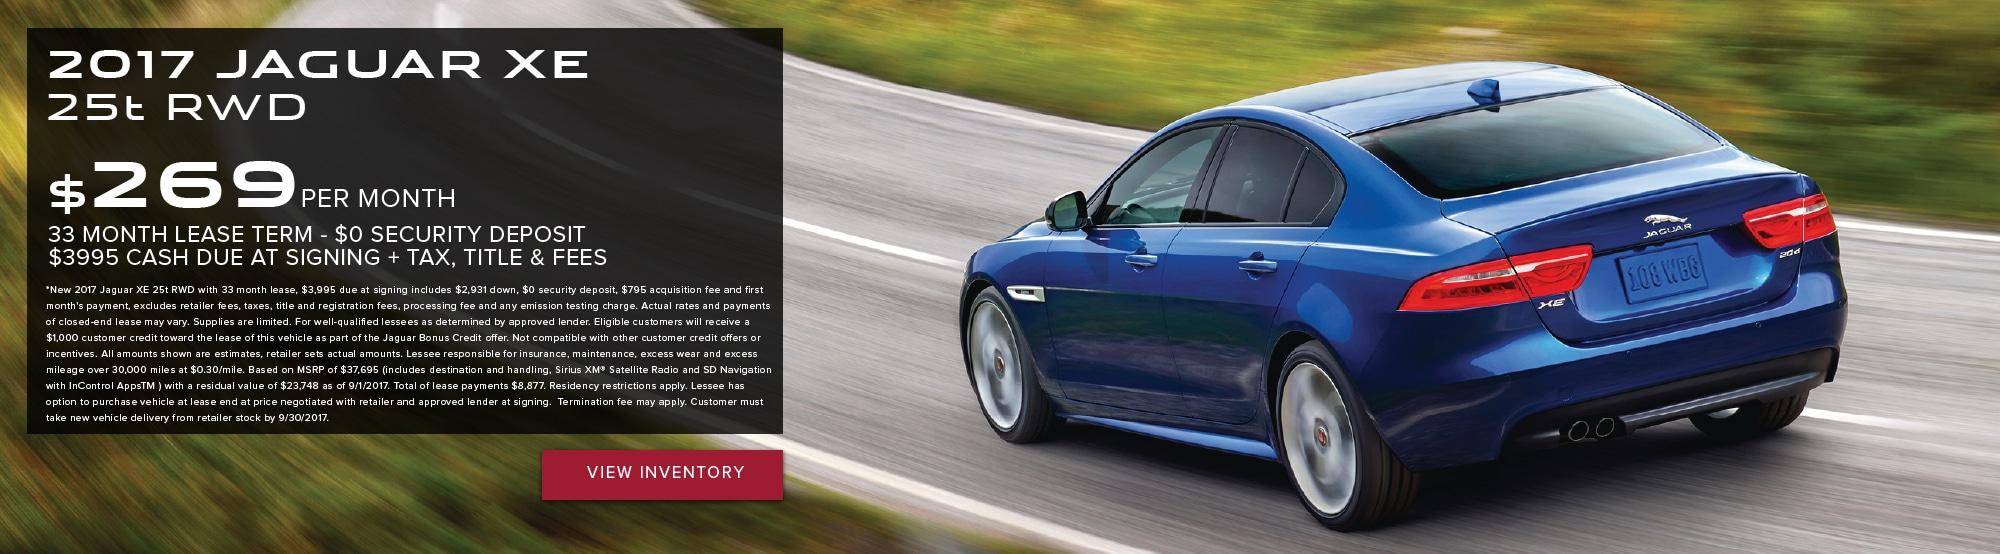 jaguar exeter new 2016 2017 jaguar amp used luxury car